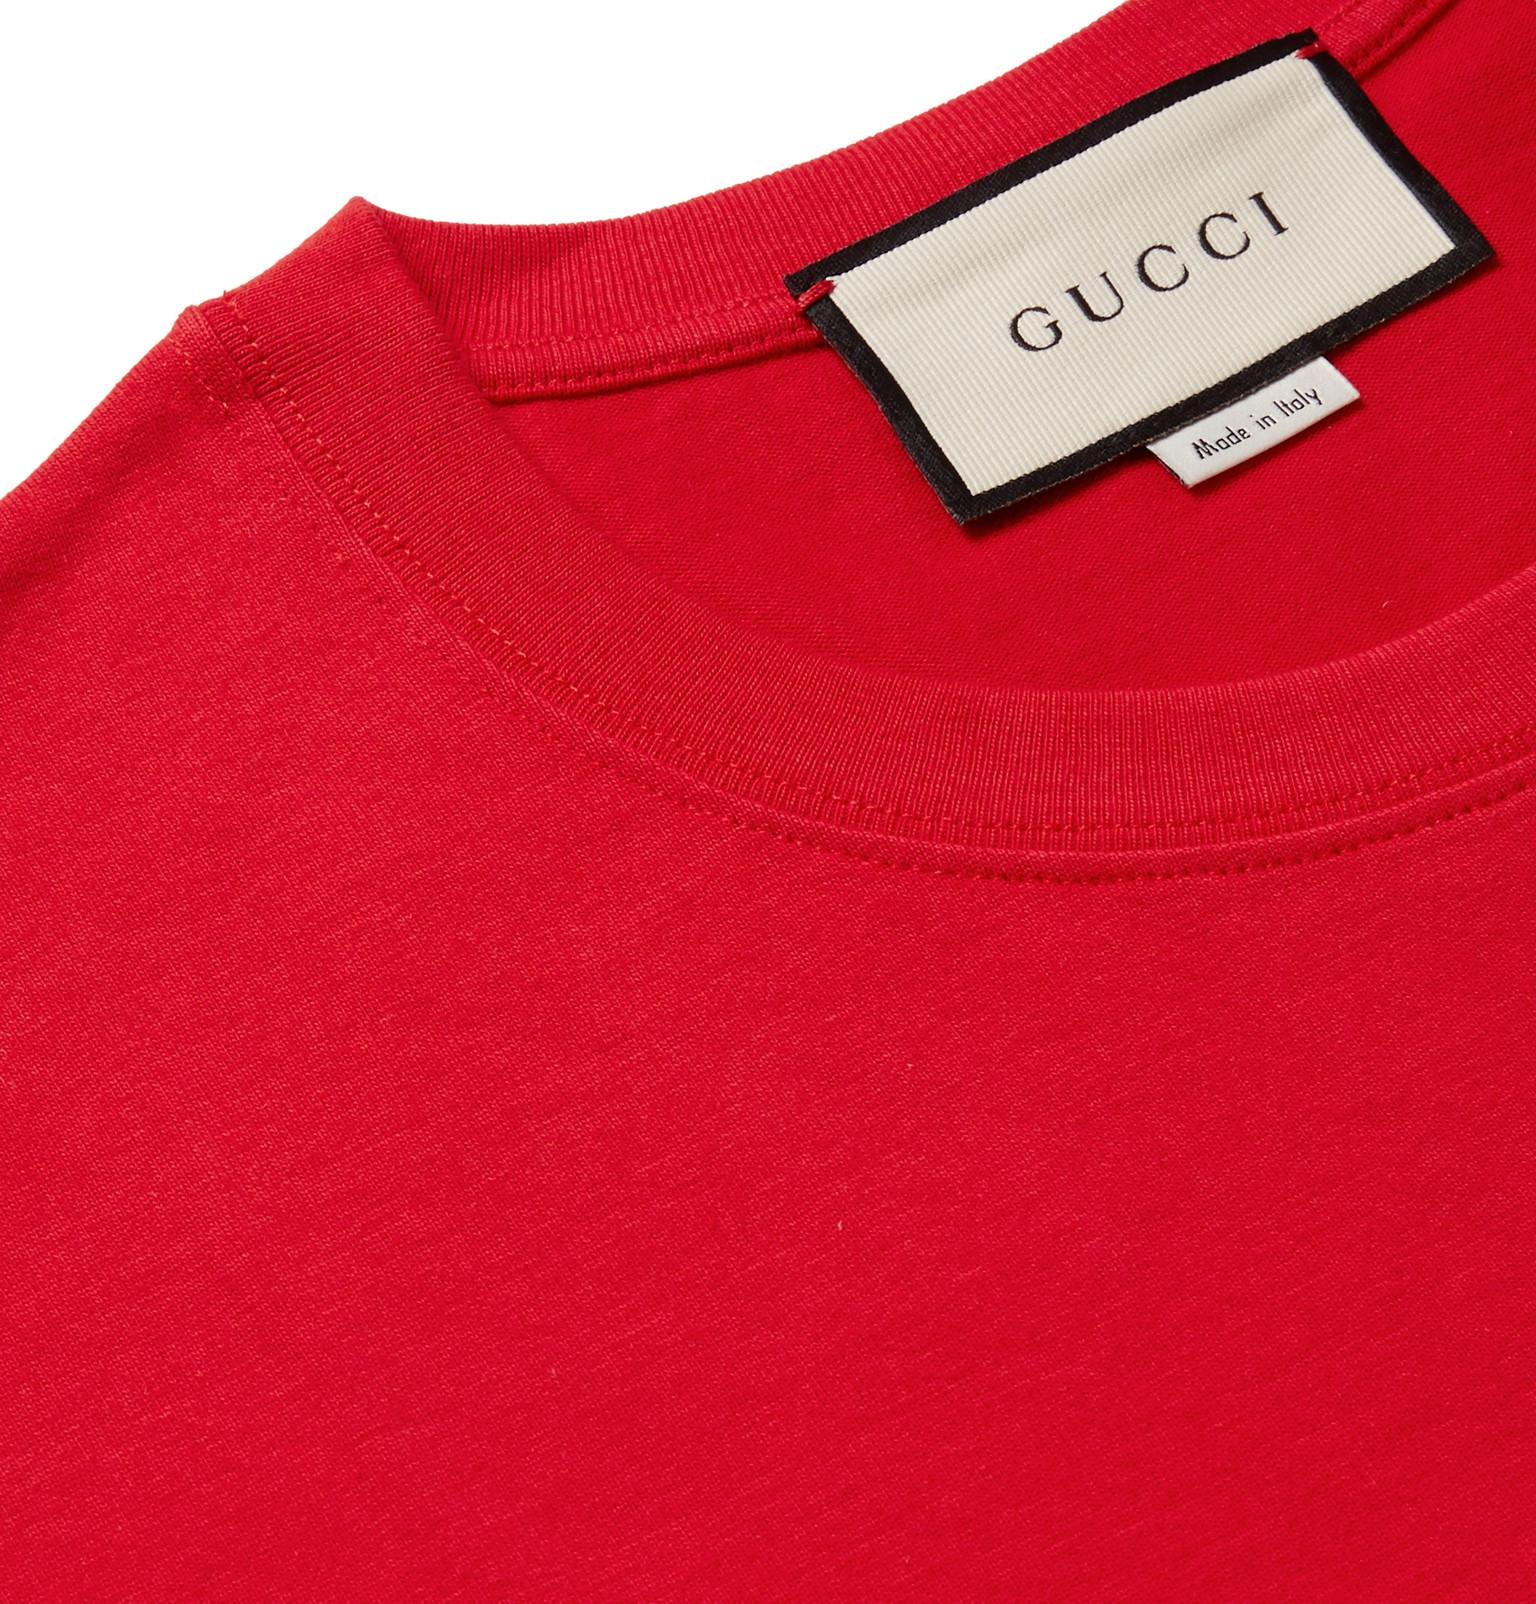 b4e4a47b2 Gucci - Logo-Embroidered Cotton-Jersey T-Shirt